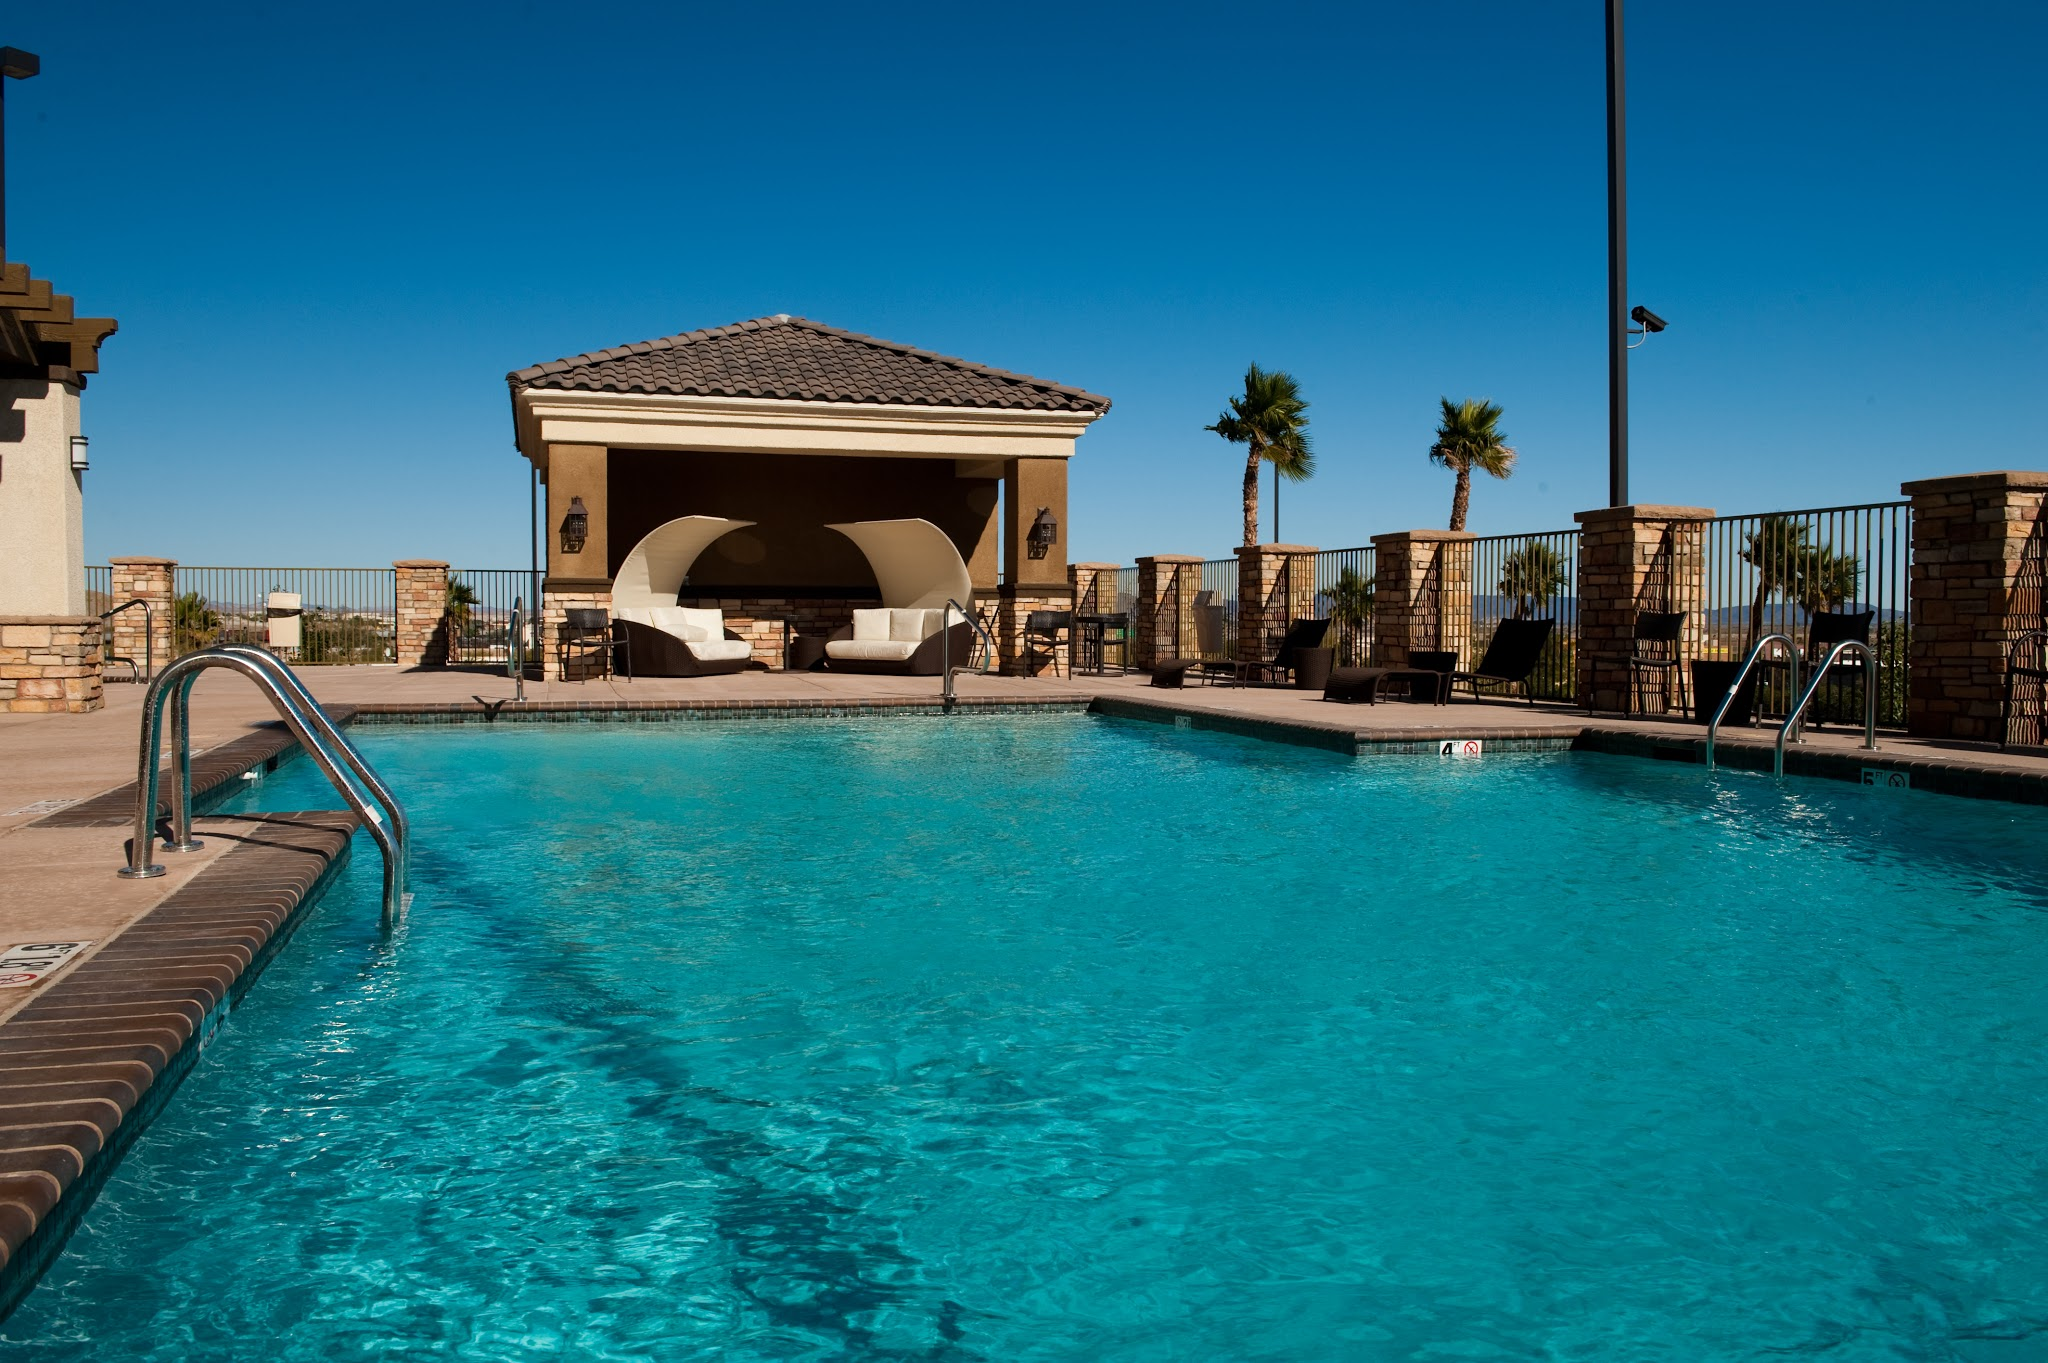 Radisson Hotel Yuma image 0